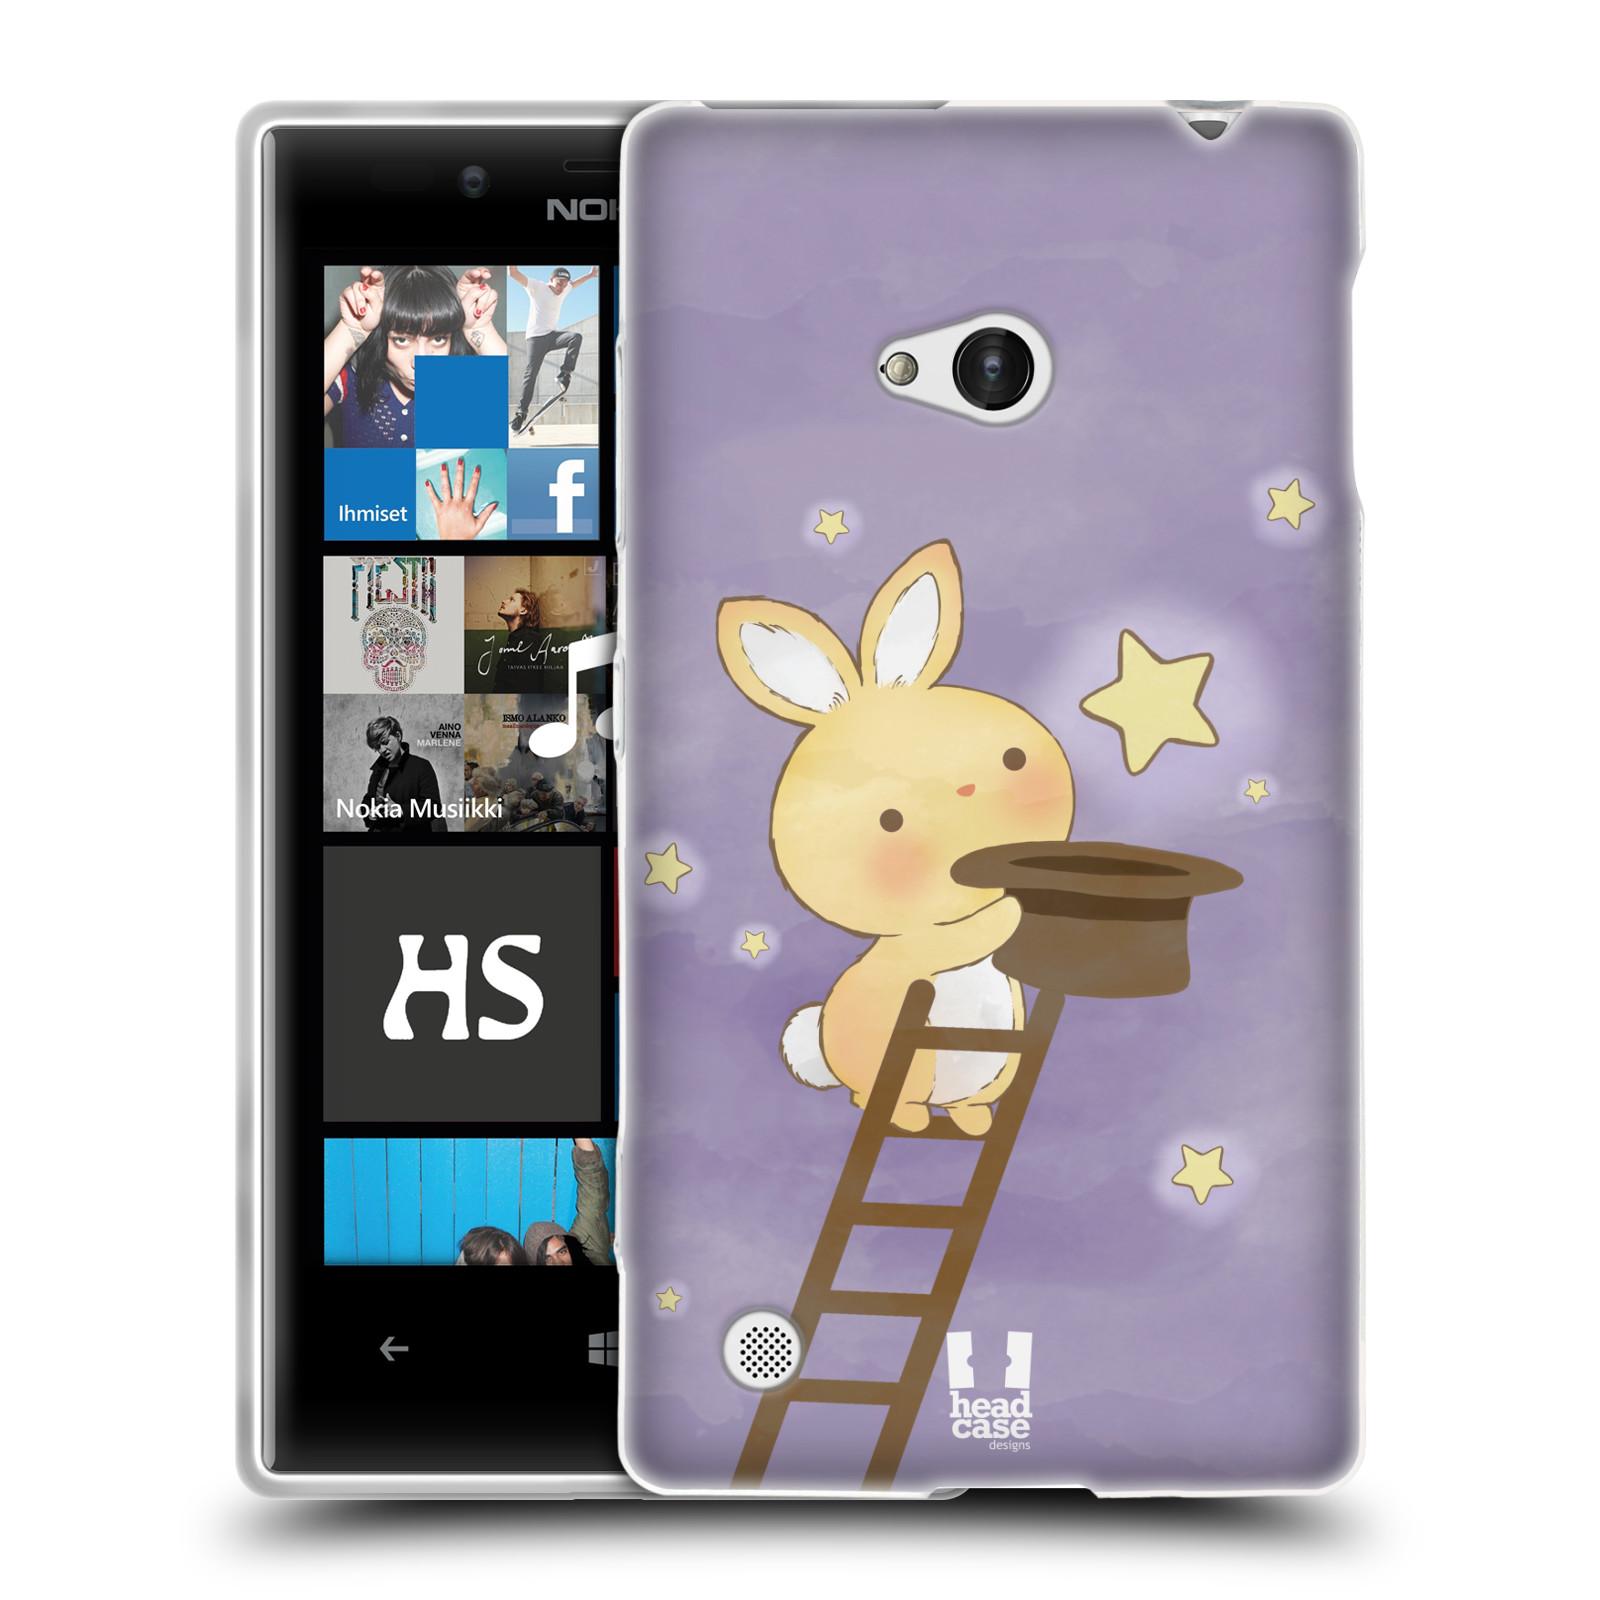 HEAD CASE silikonový obal na mobil NOKIA Lumia 720 vzor králíček a hvězdy fialová